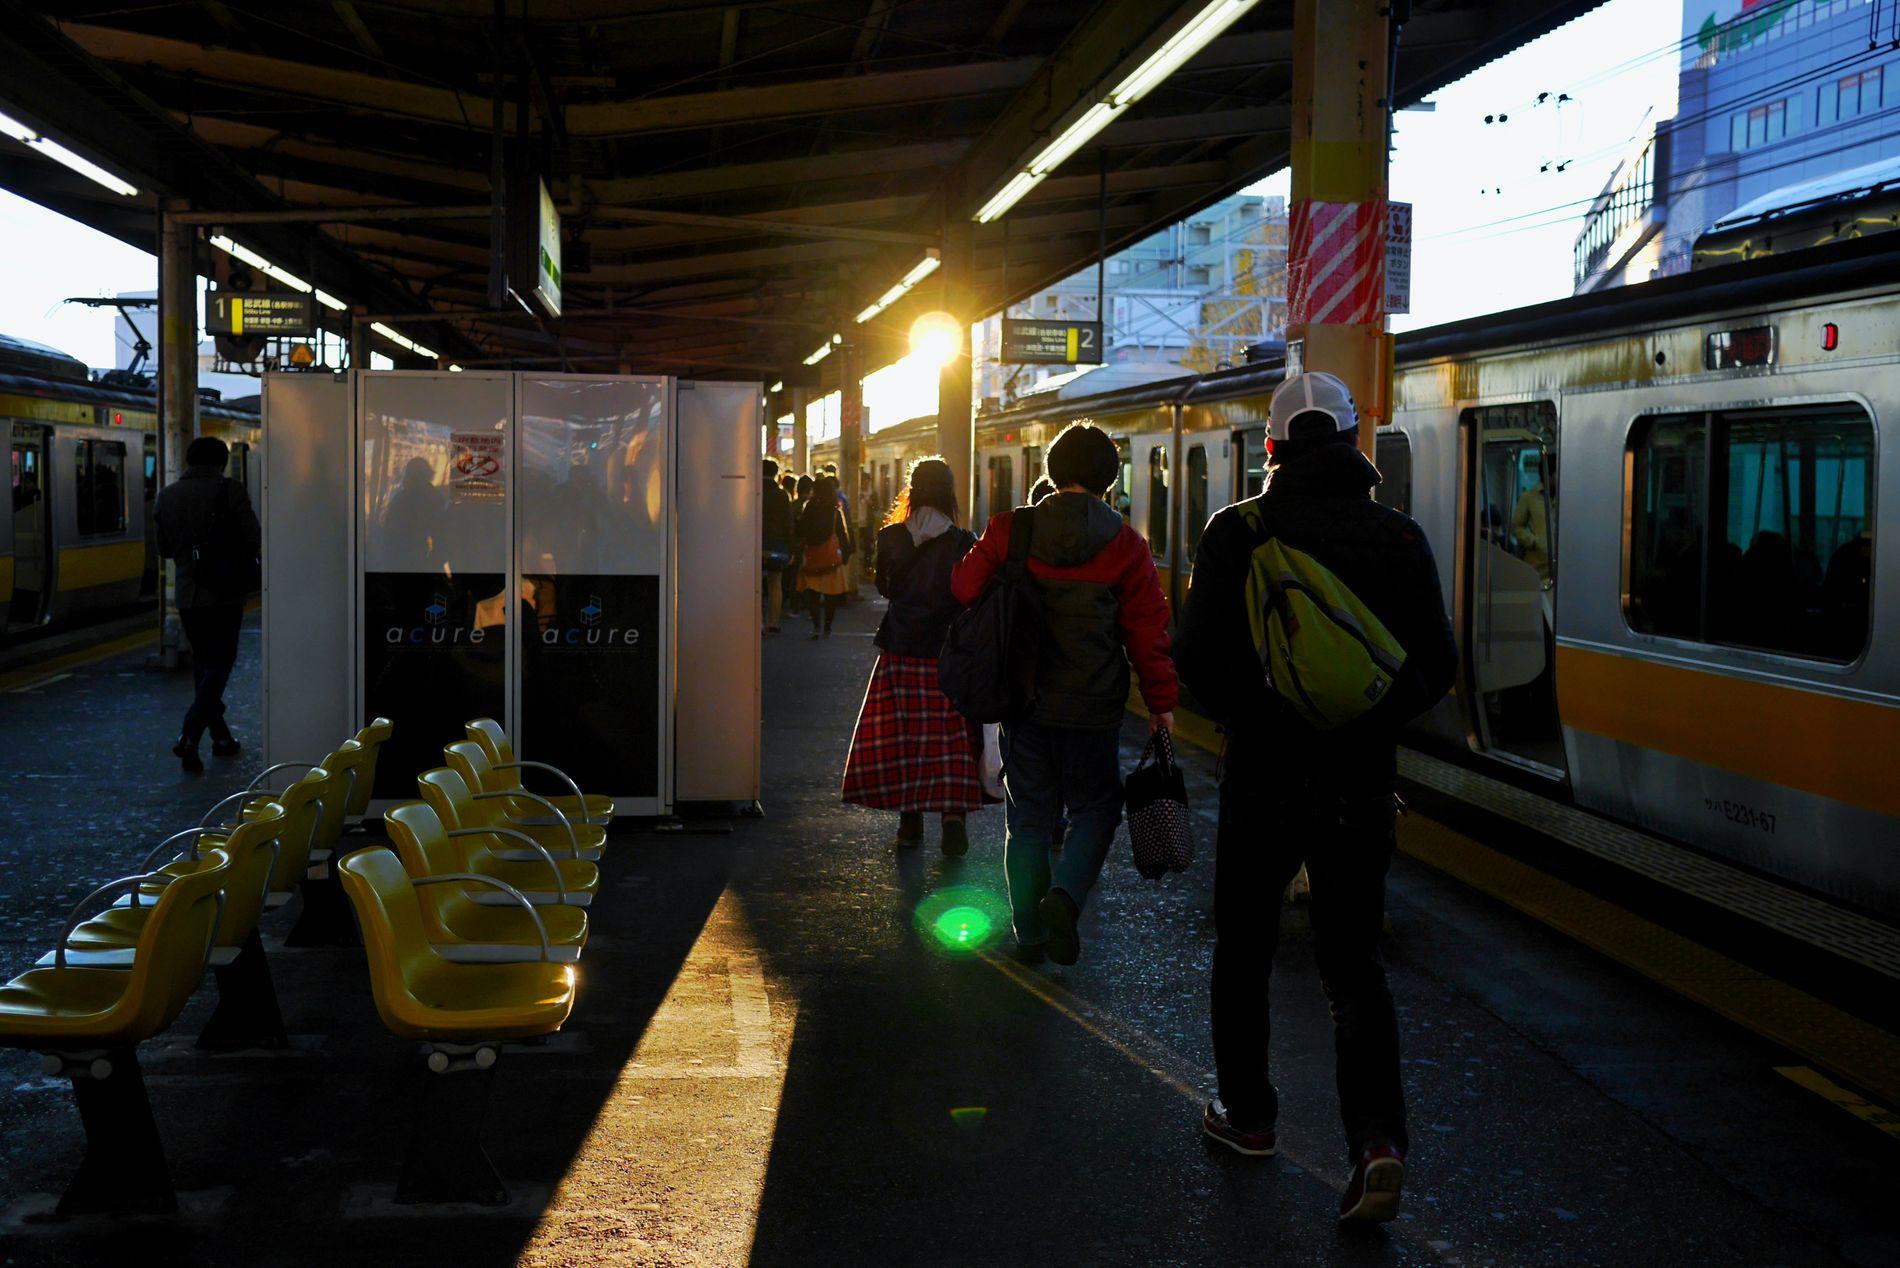 The last work day/仕事納めた。今年は呑んだくれないでとっとと消える Lastworkday Lastworkingdayof2015 Goinghome Train Station LUMIX DMC-GM5K in Tokyo Japan 写真は今日じゃないけど